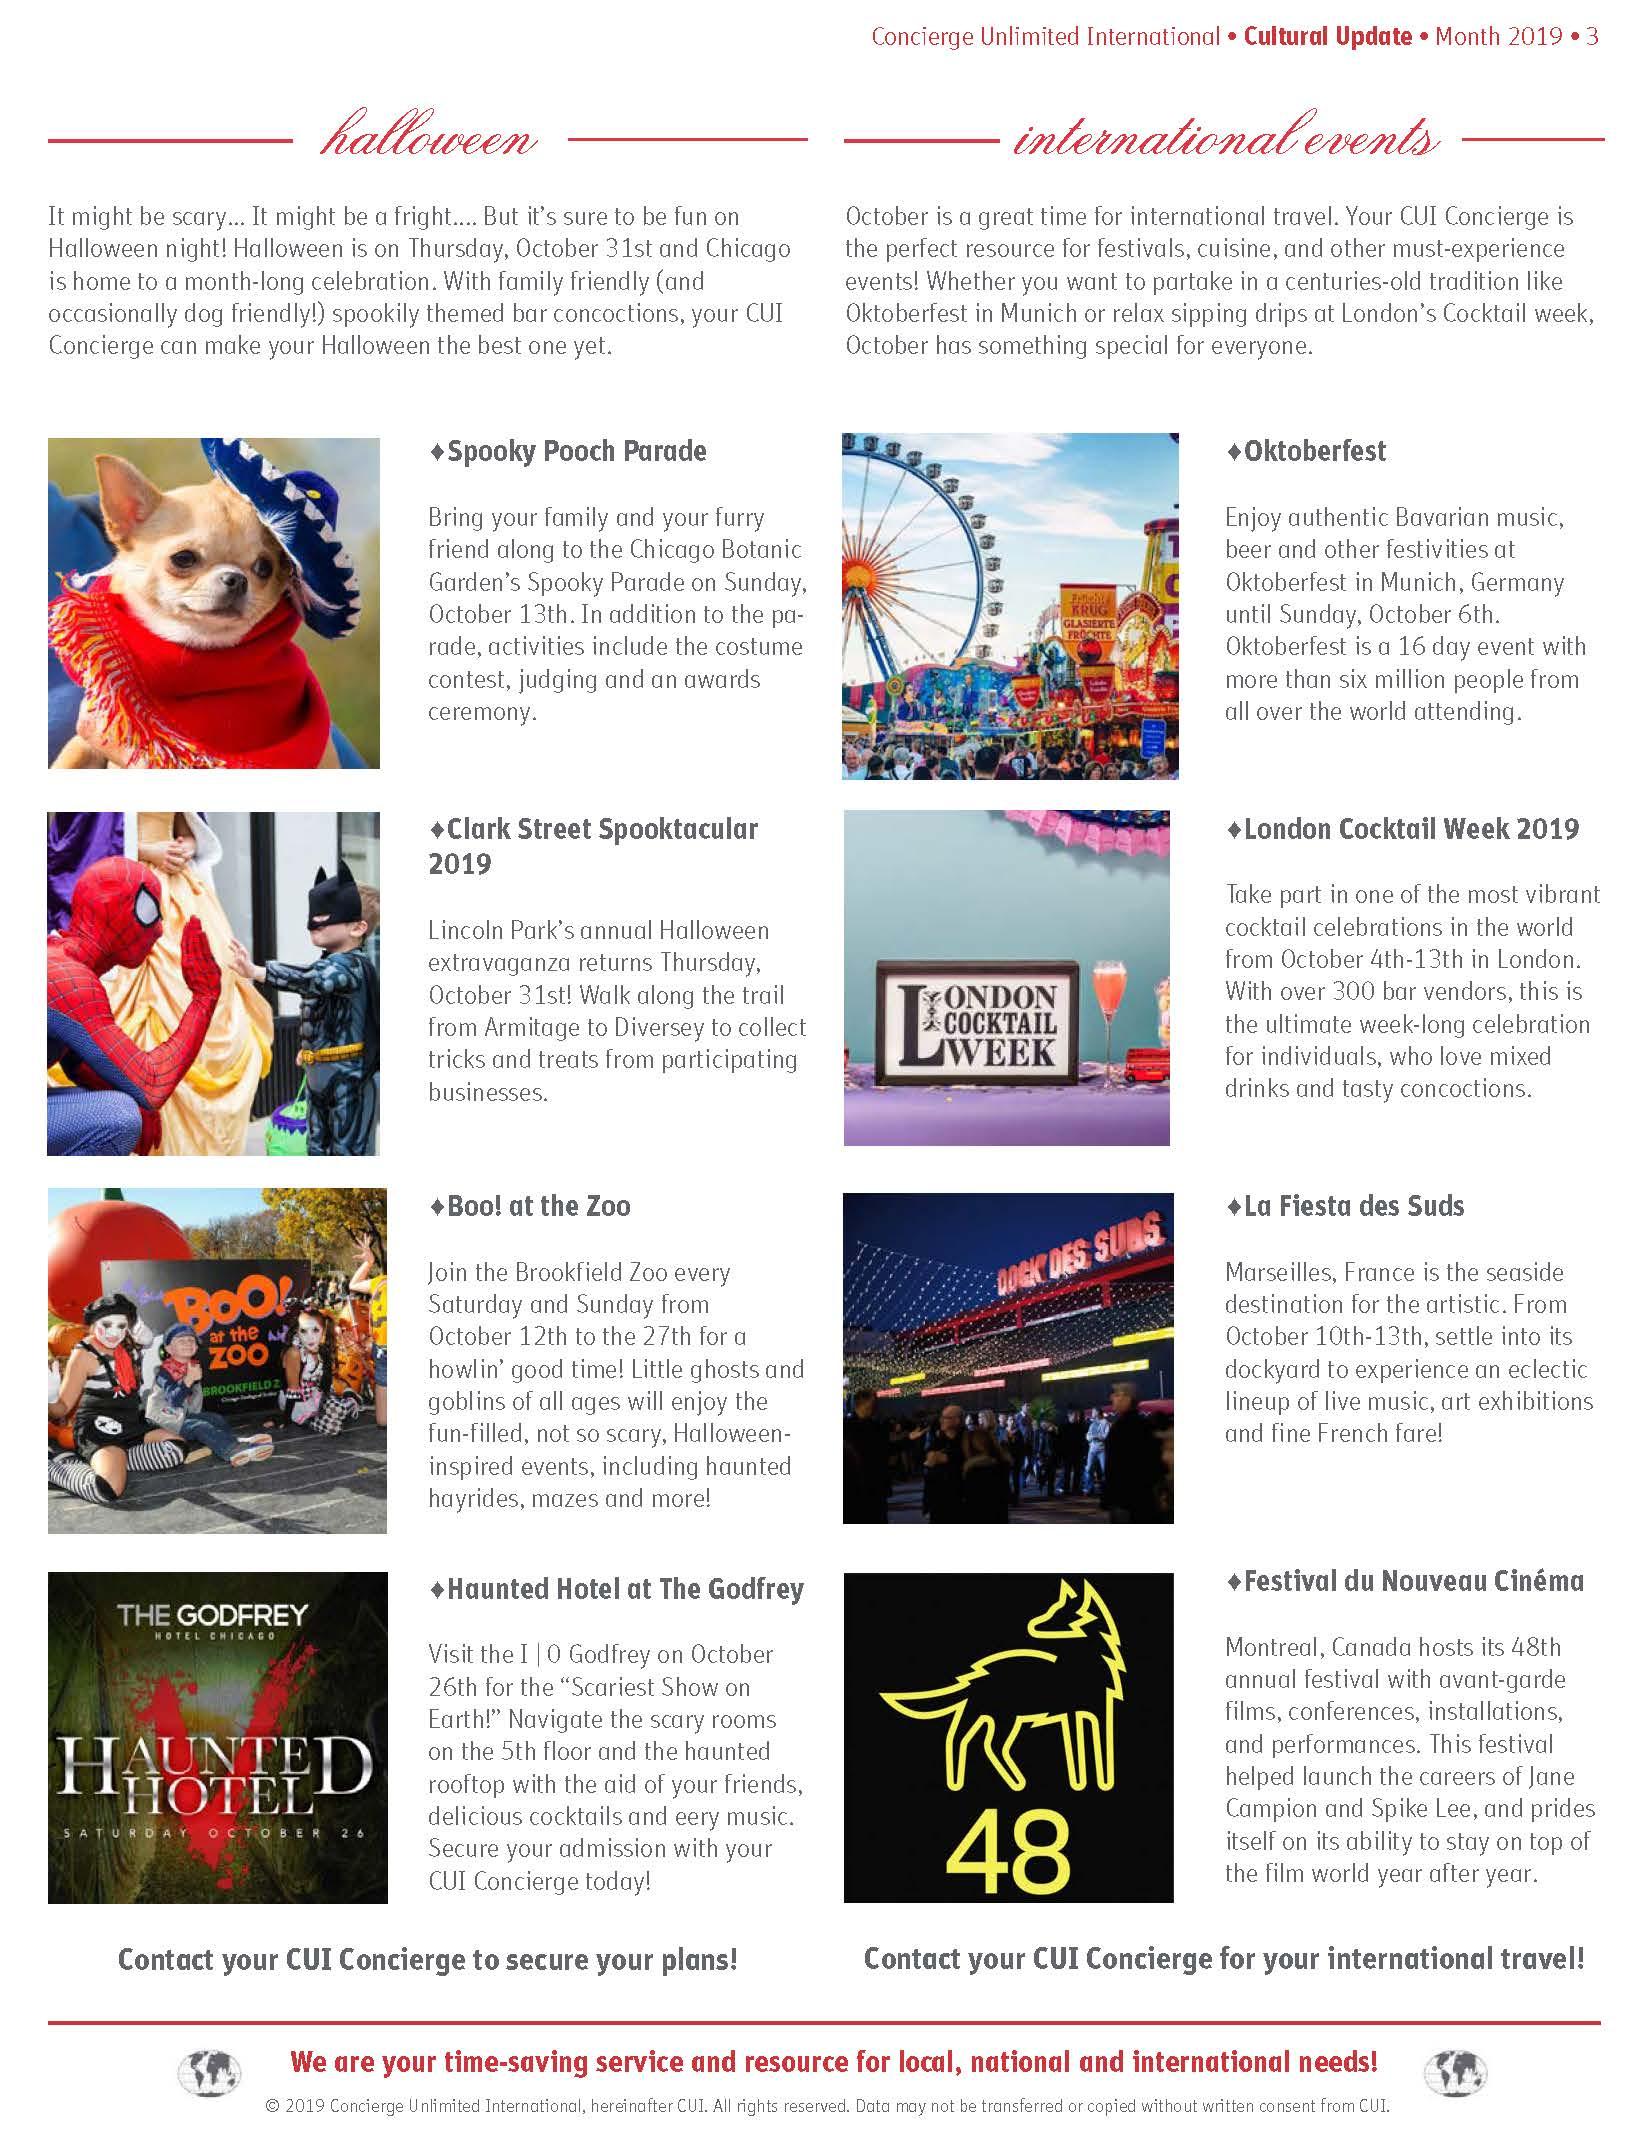 NWOC - October Cultural Update_Page_3.jpg